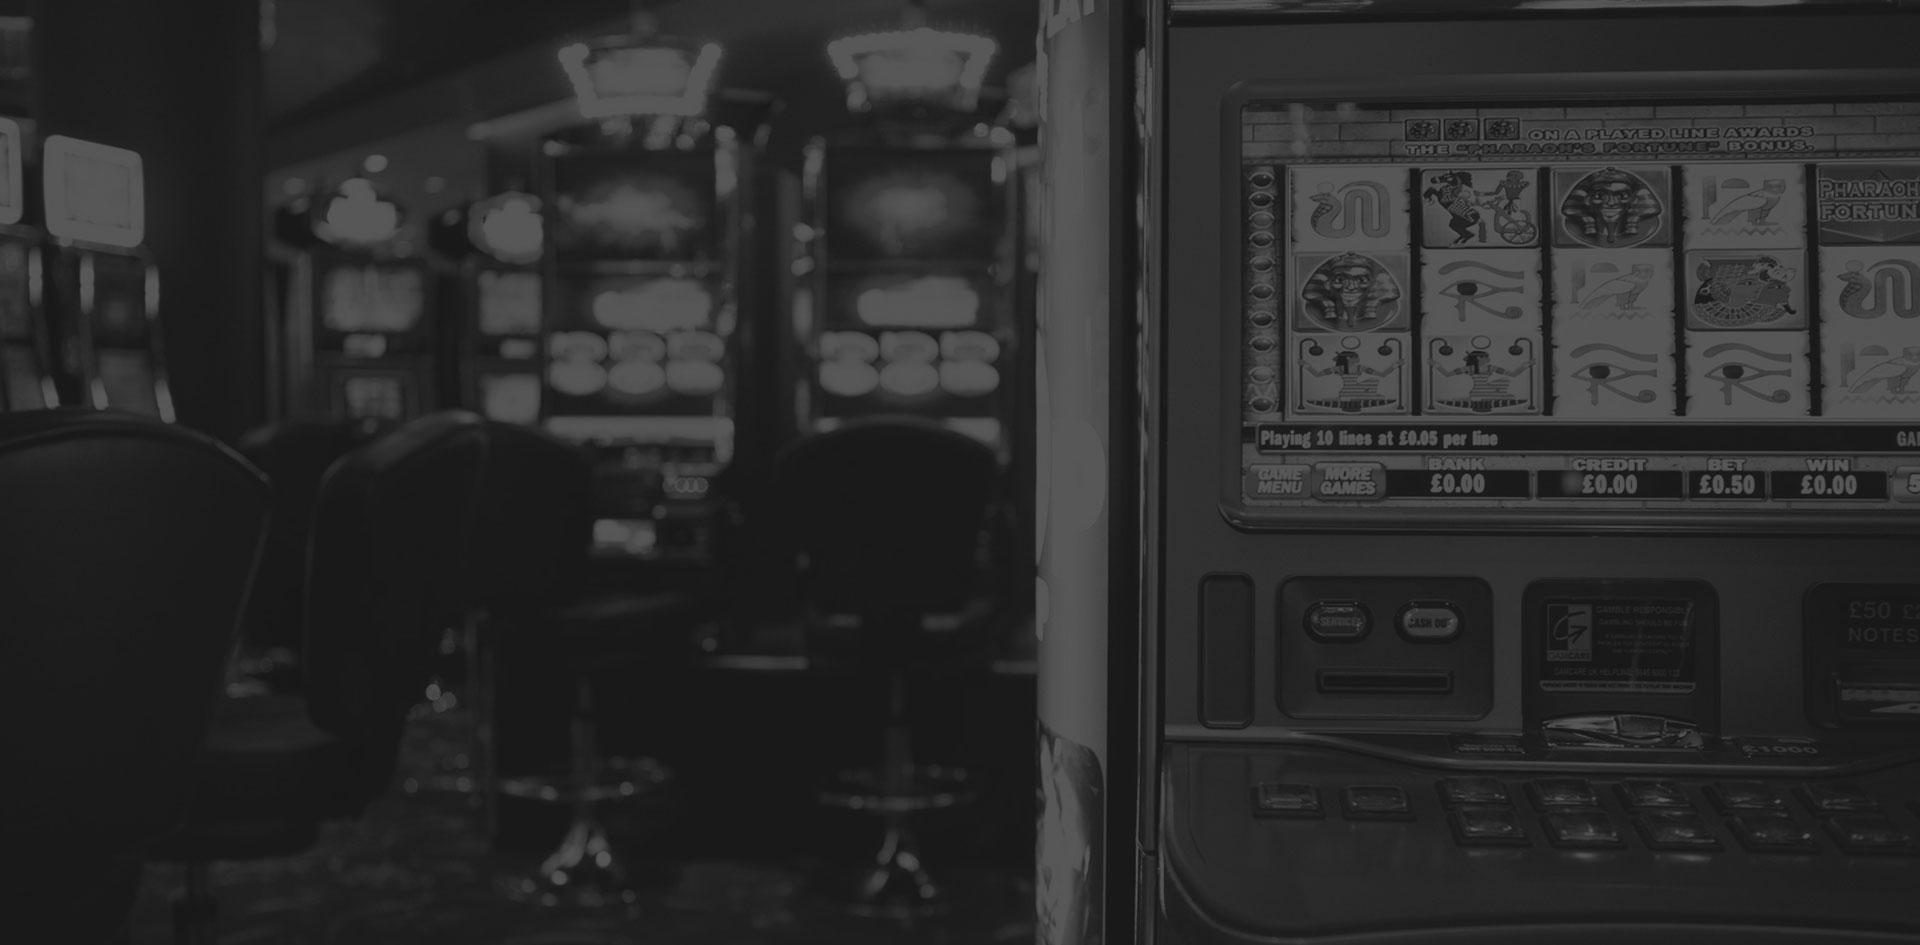 lincoln casino no deposit